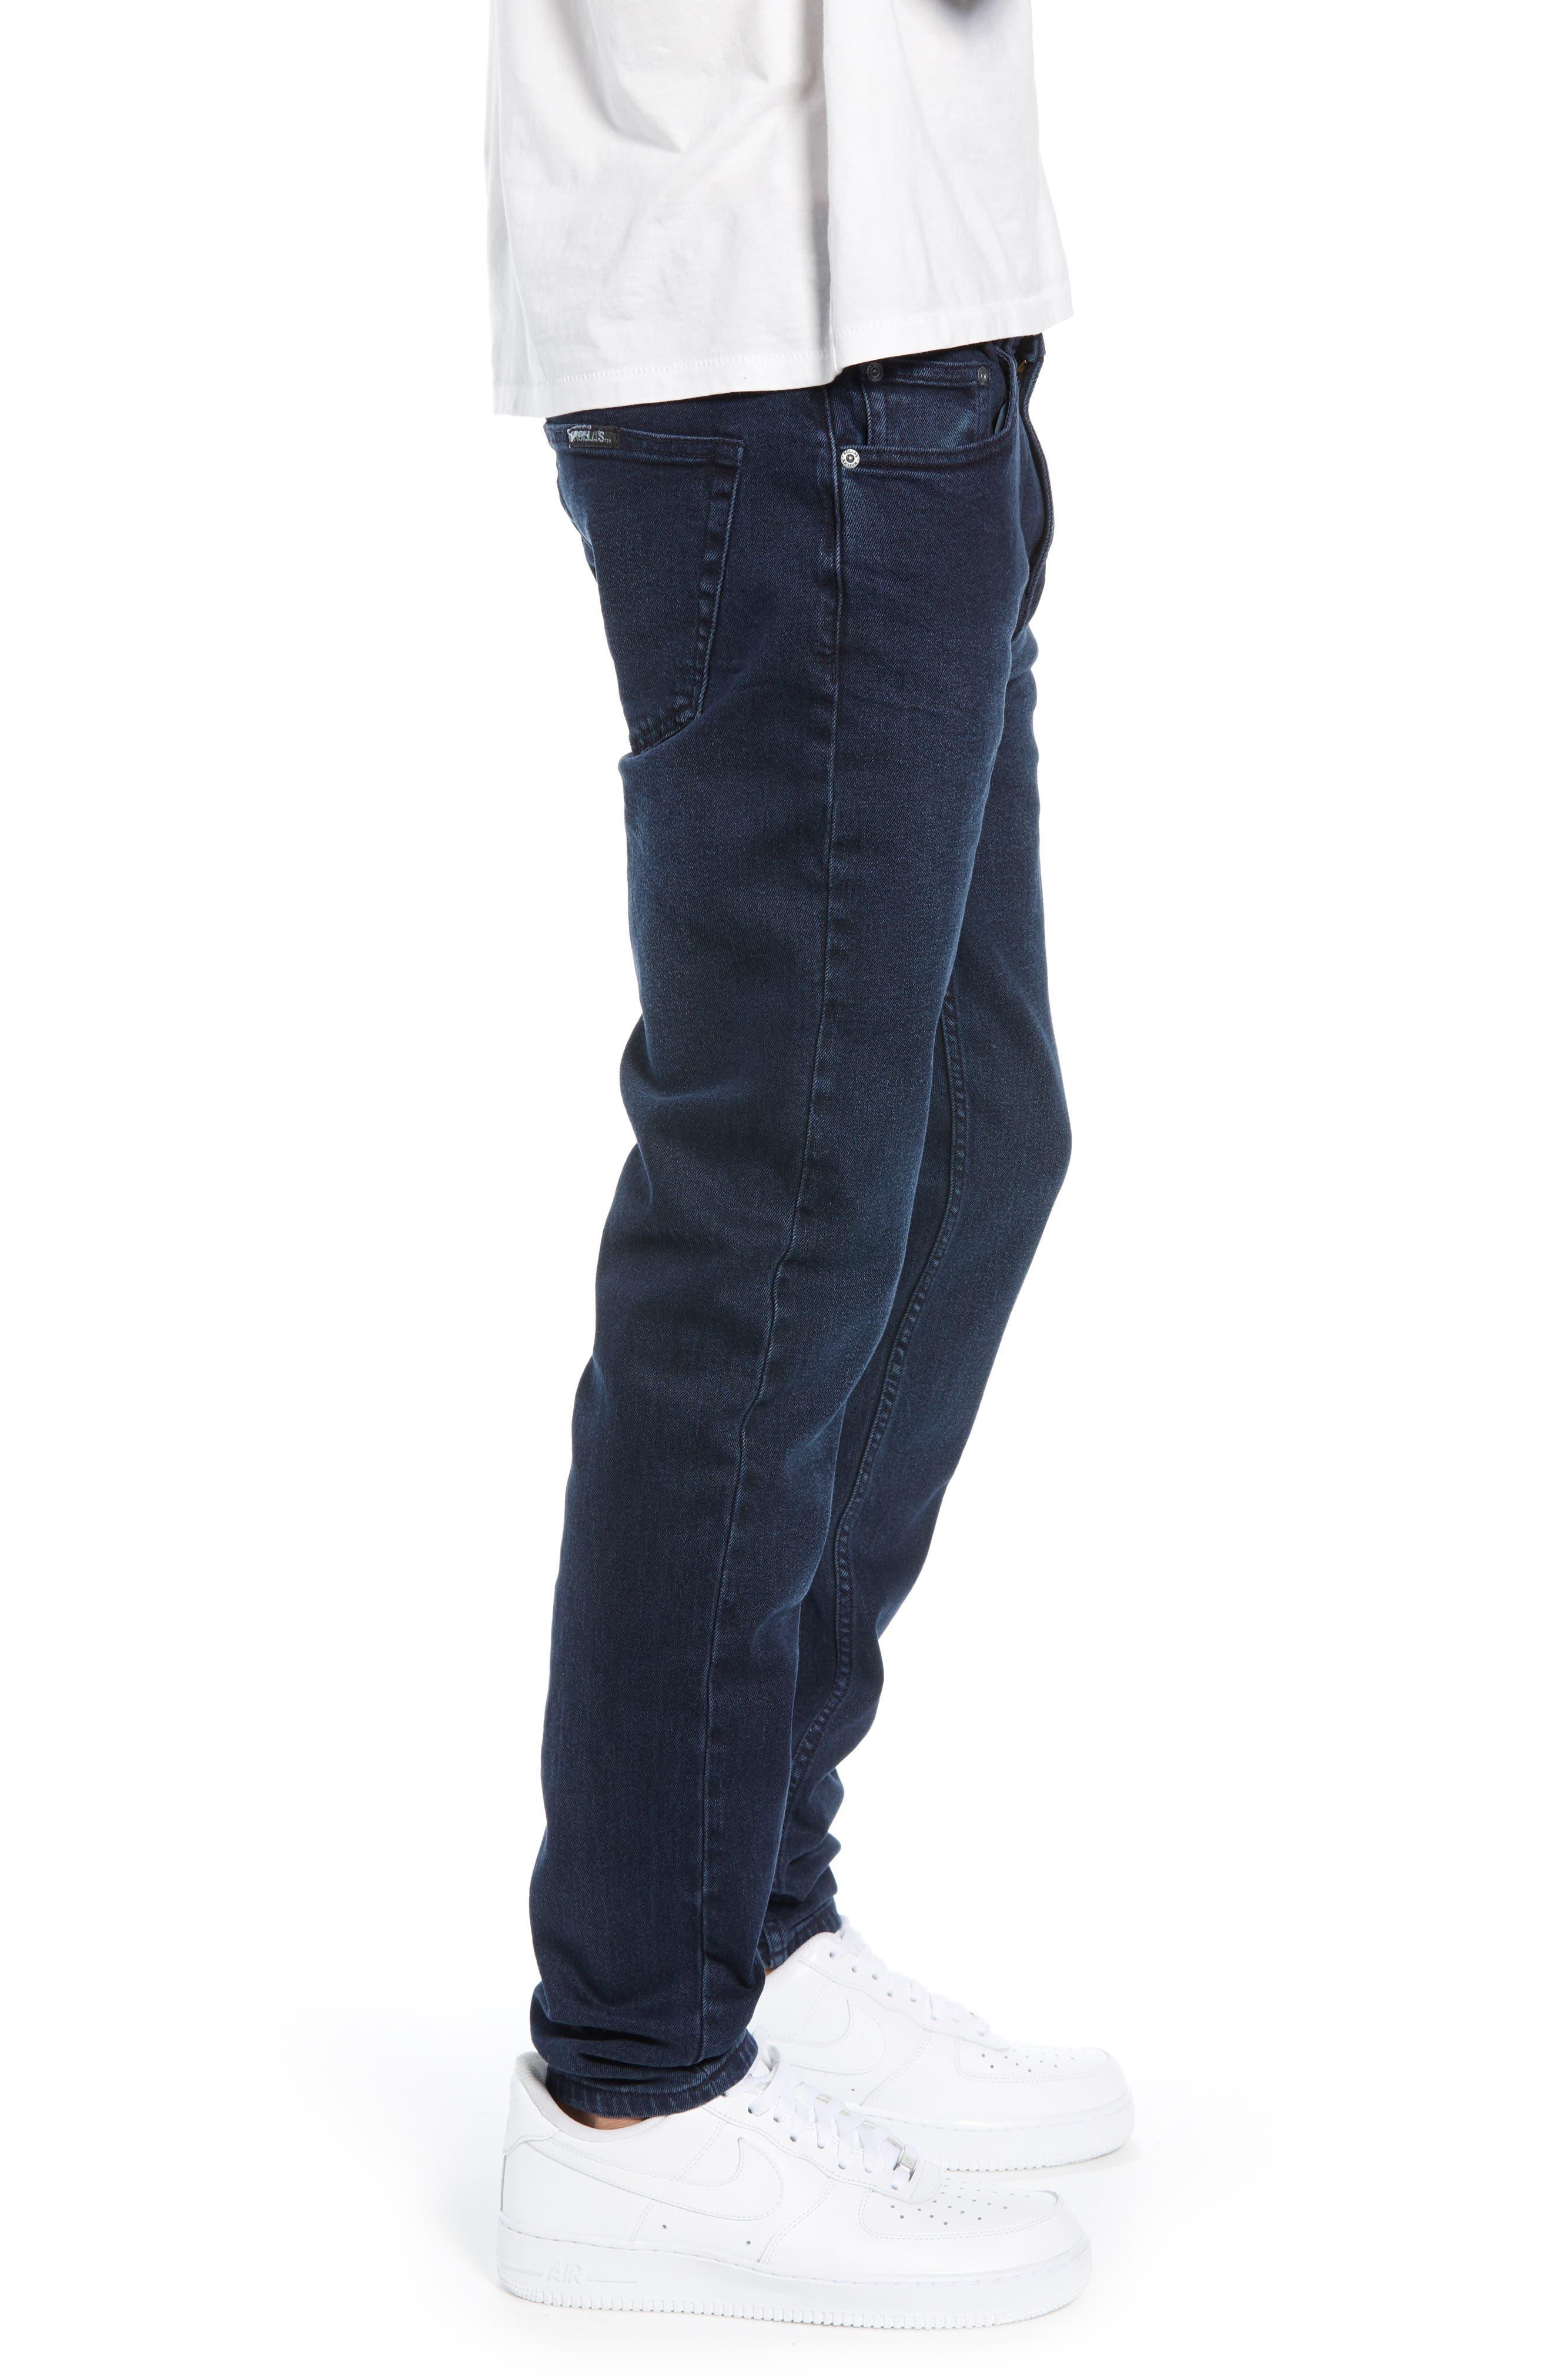 Stinger Skinny Fit Jeans,                             Alternate thumbnail 3, color,                             STONE FREE BLUE